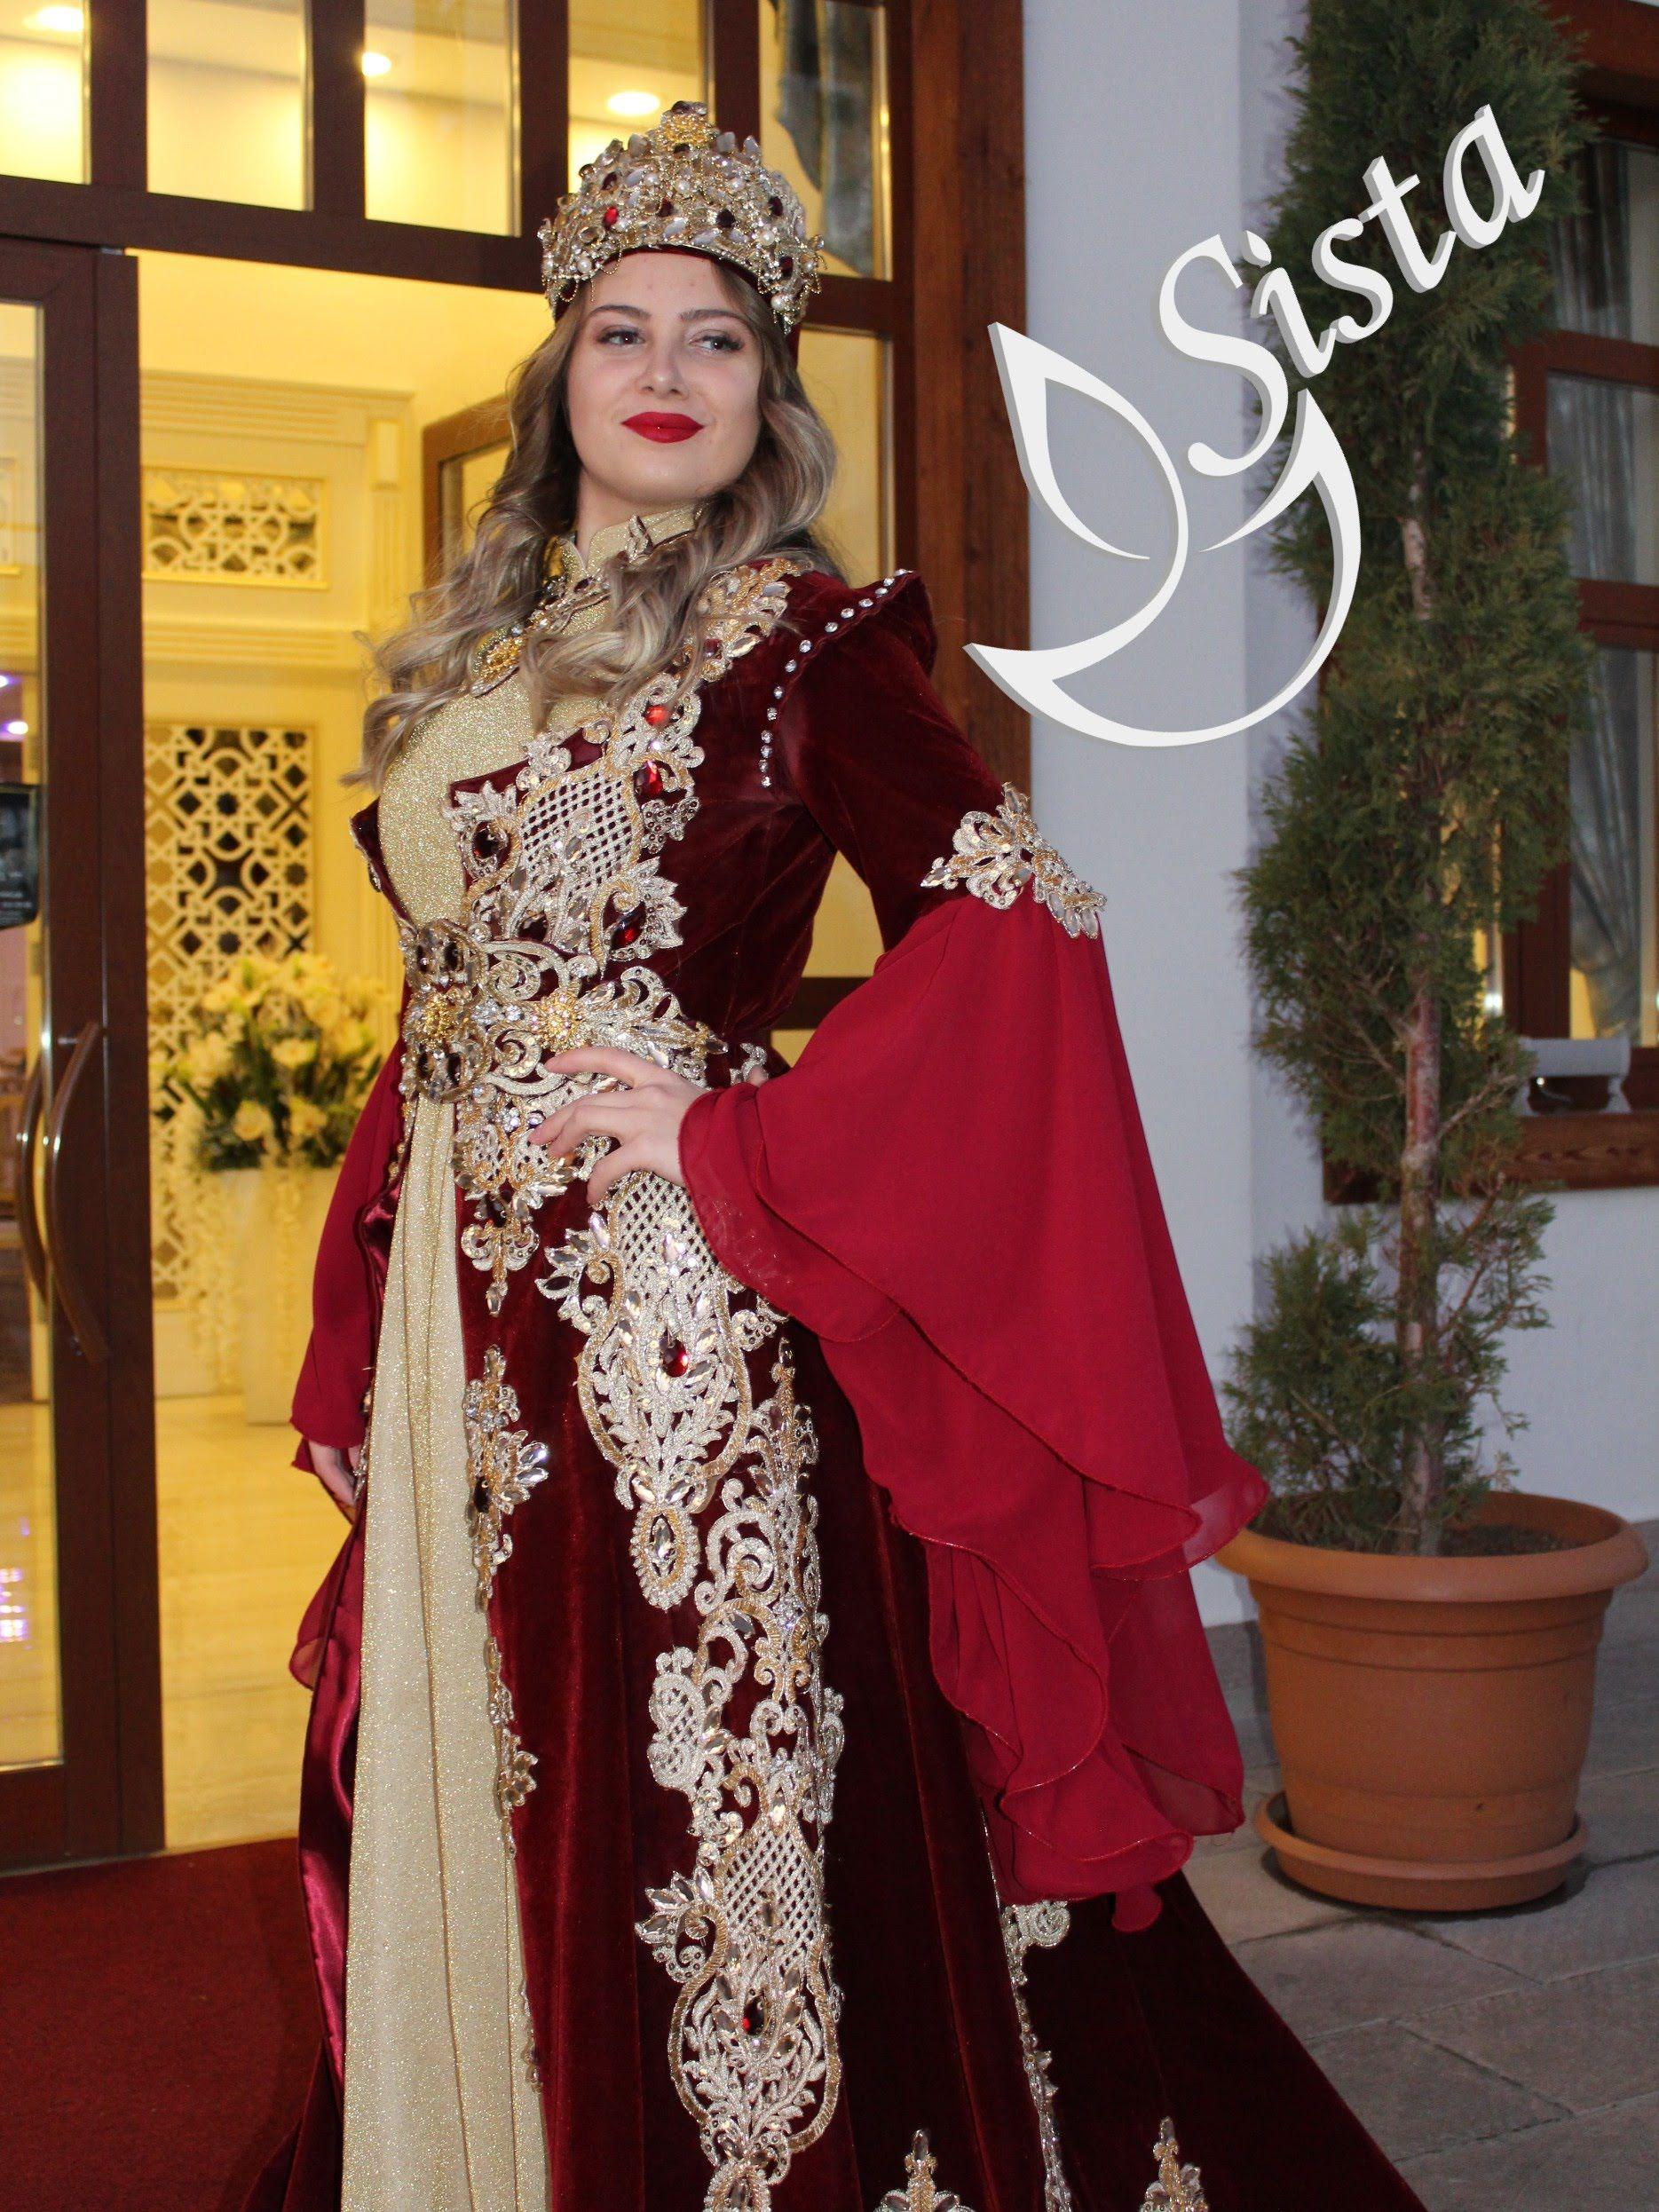 Sista Bindalli Kaftan In 2020 Fashion Formal Dresses Long Formal Dresses